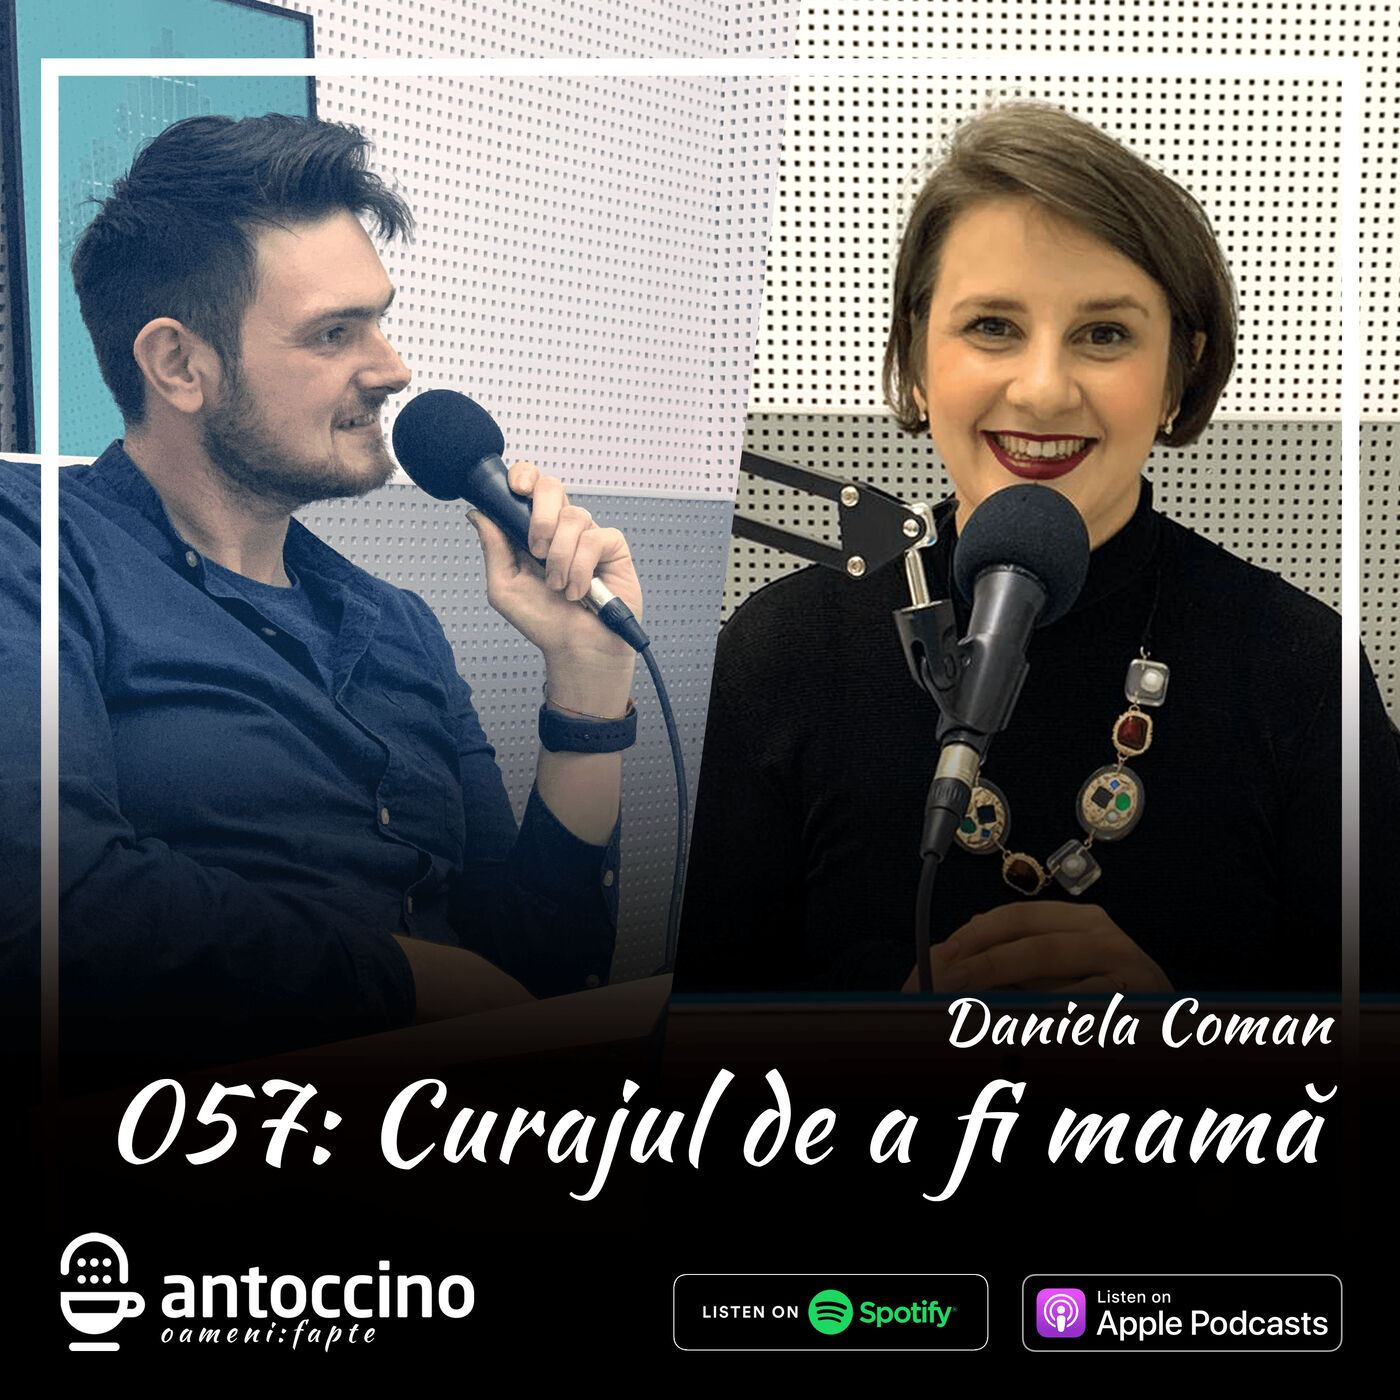 057. Daniela Coman: Curajul de fi mama #comanica